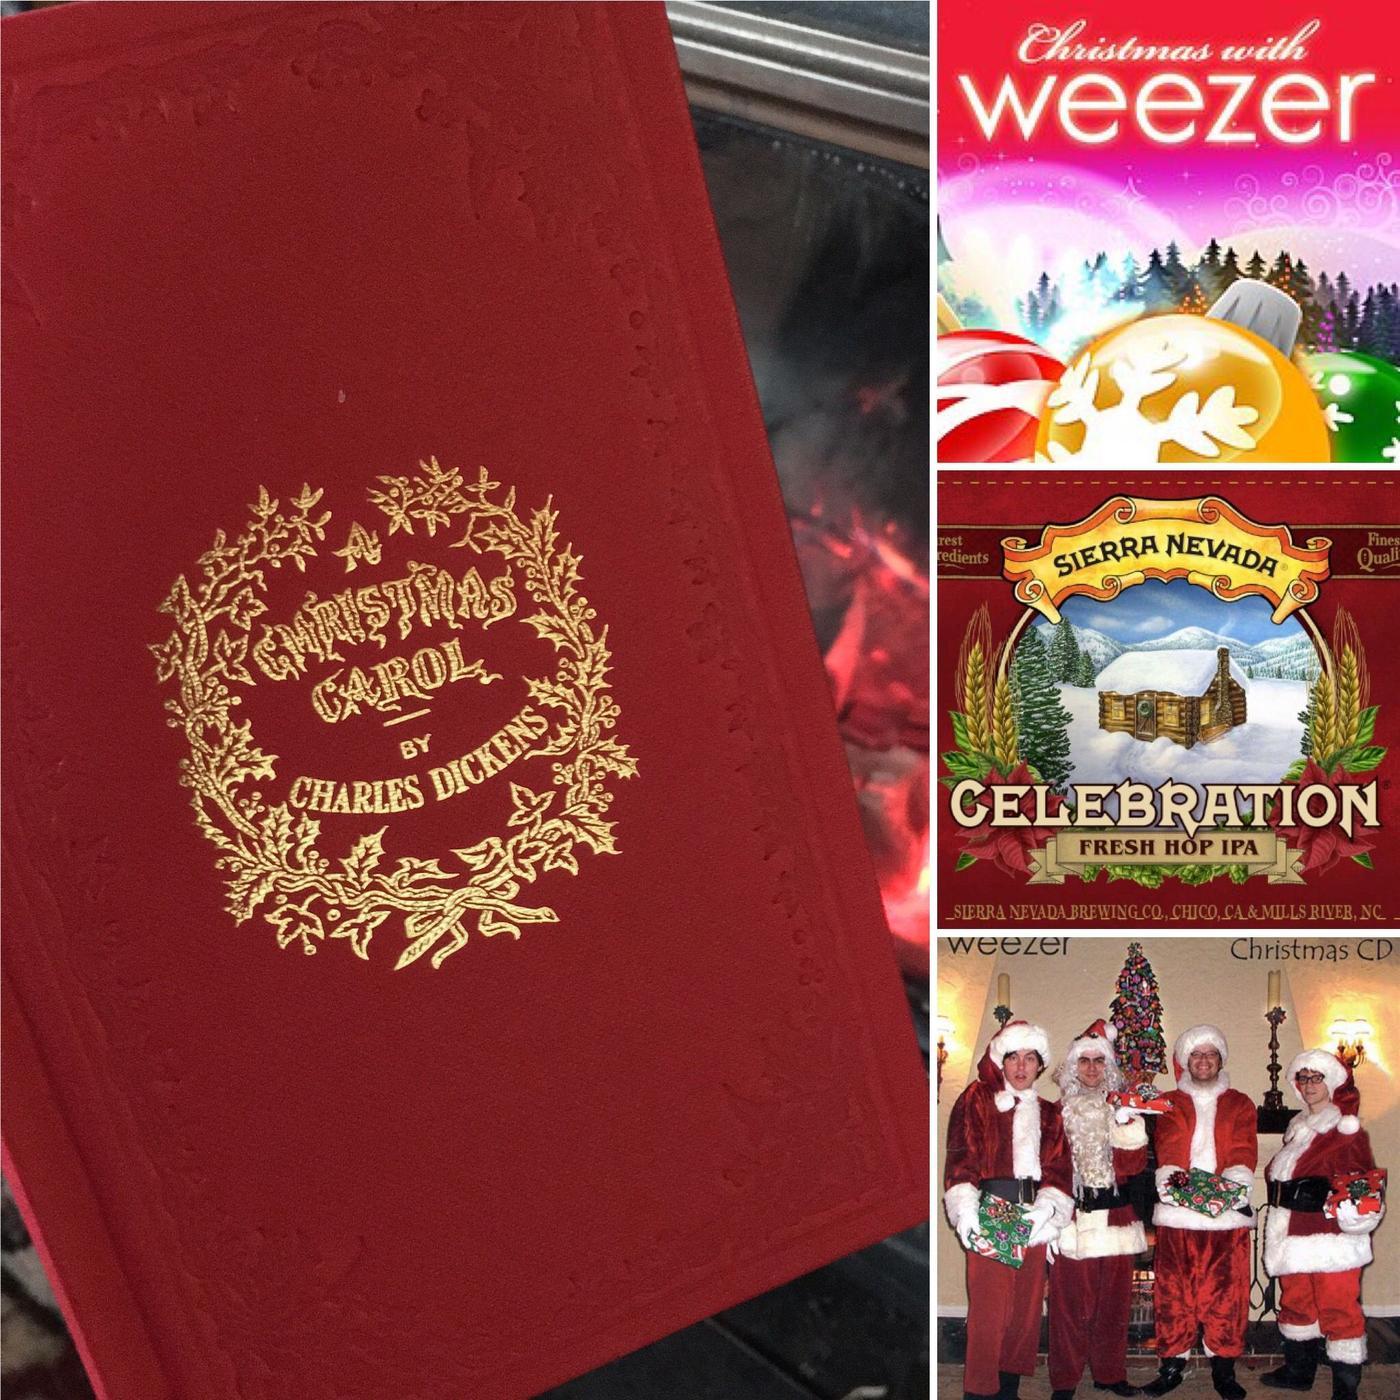 Weezer Christmas.S3 E3 A Christmas Carol Christmas With Weezer